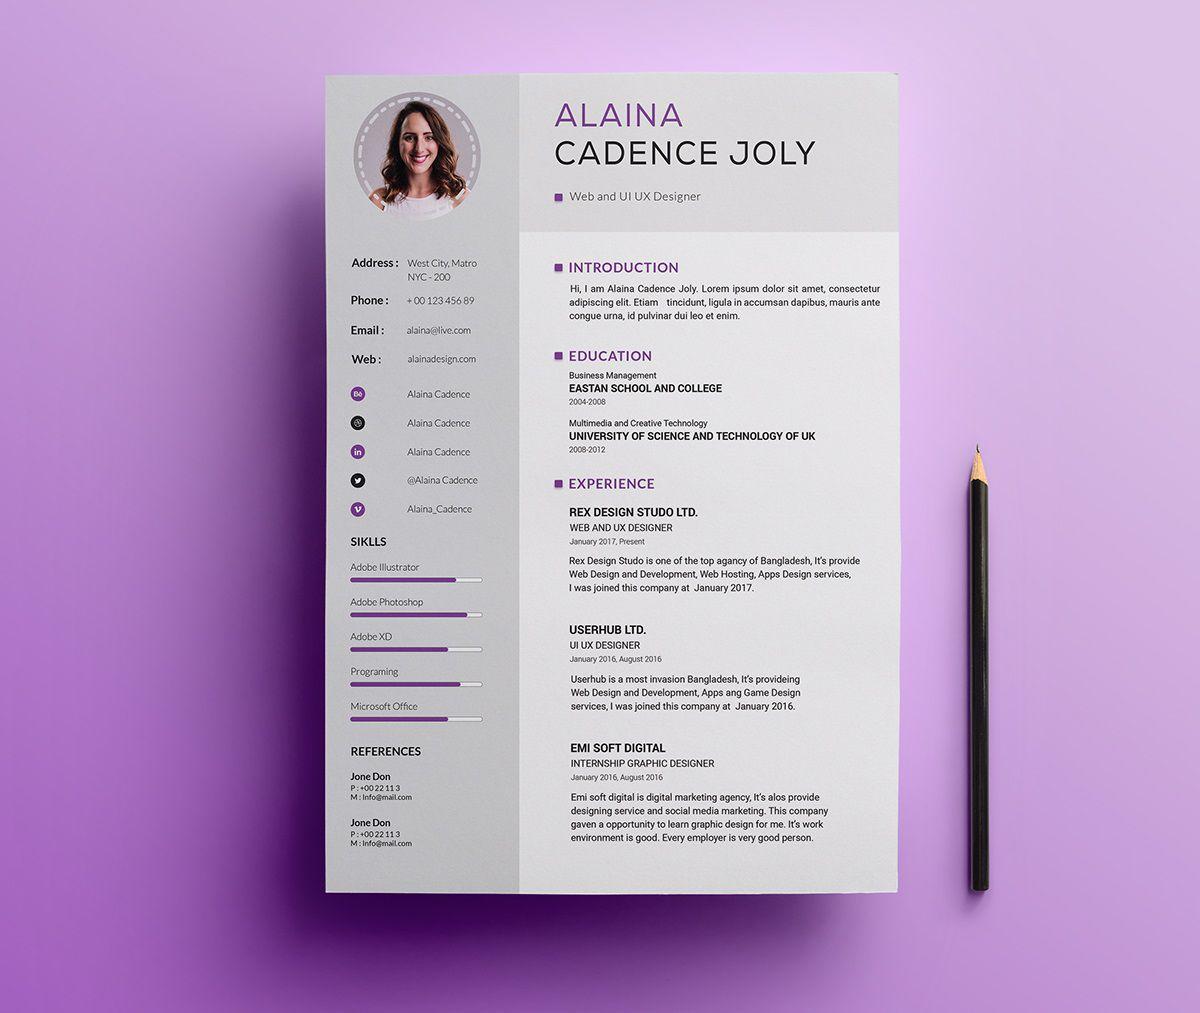 005 Impressive Professional Resume Template 2018 Free Download Idea Full